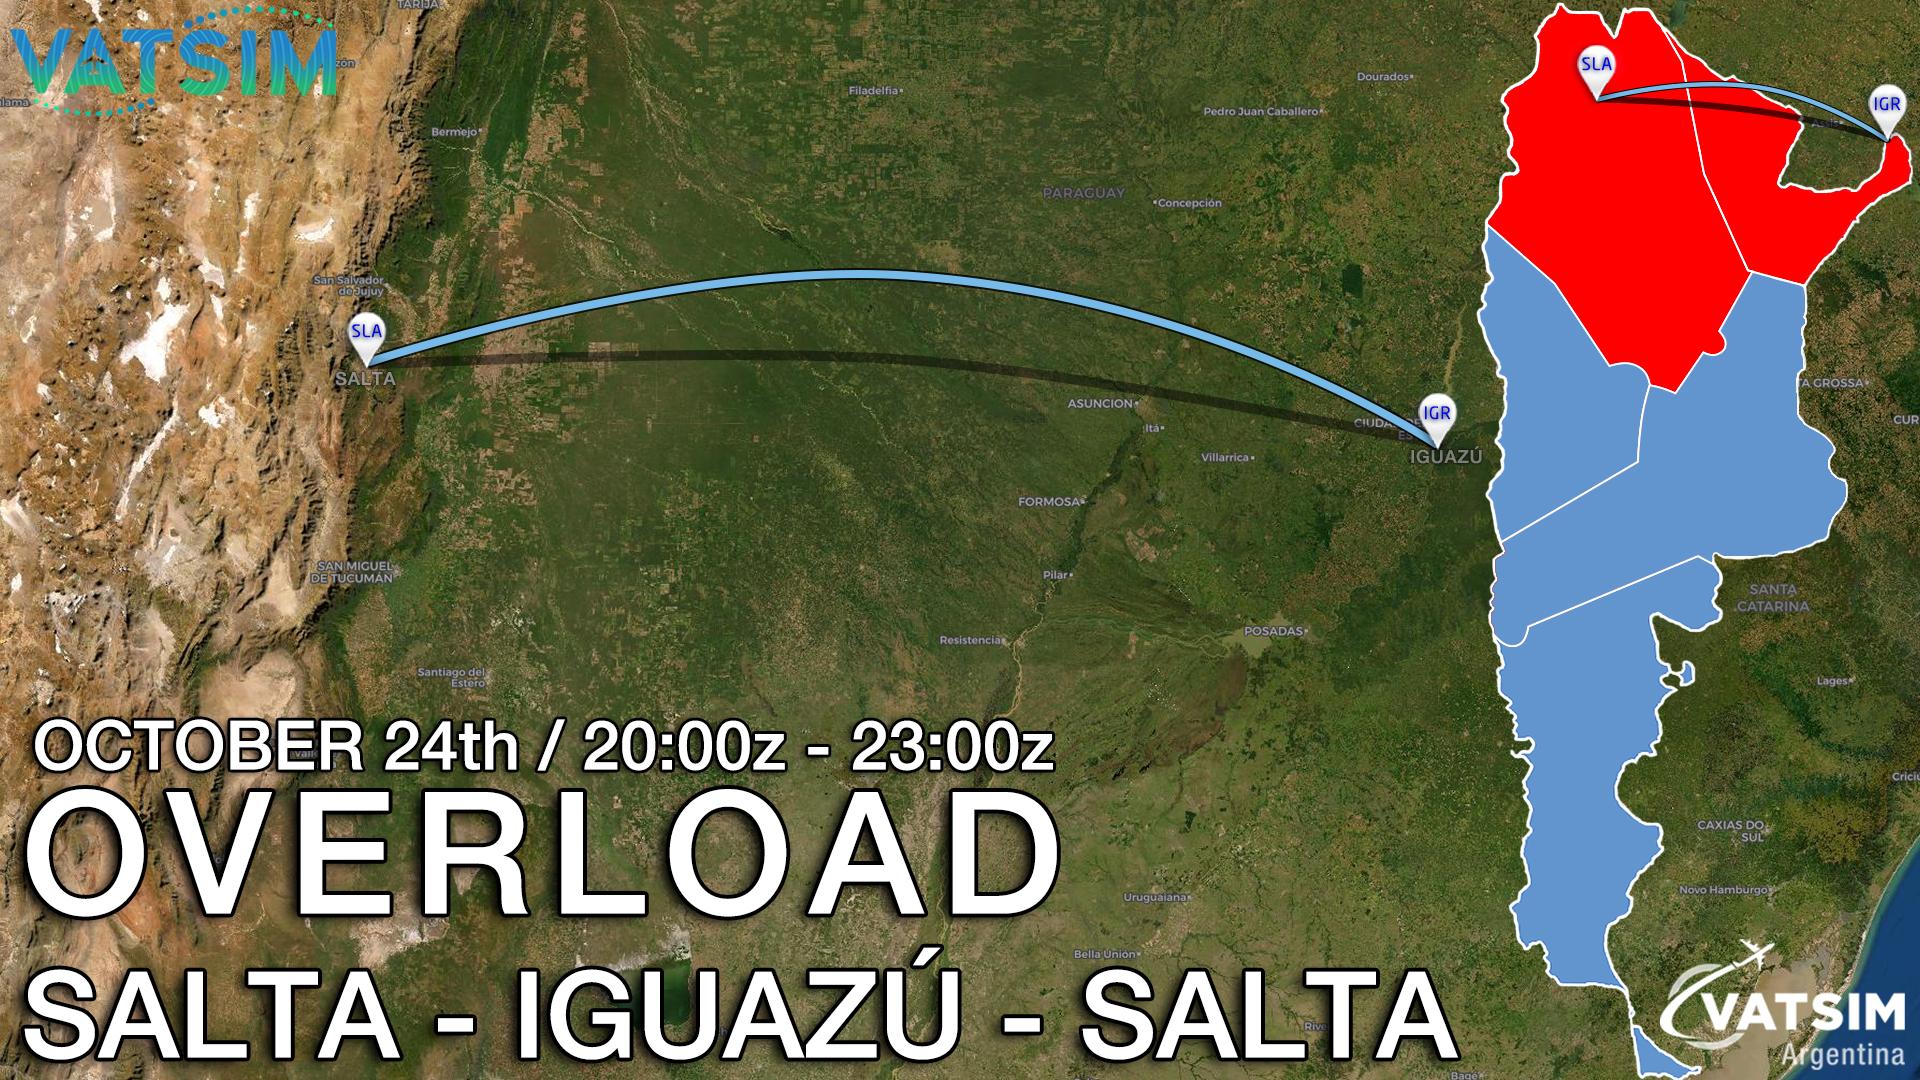 OVERLOAD SALTA/IGUAZU